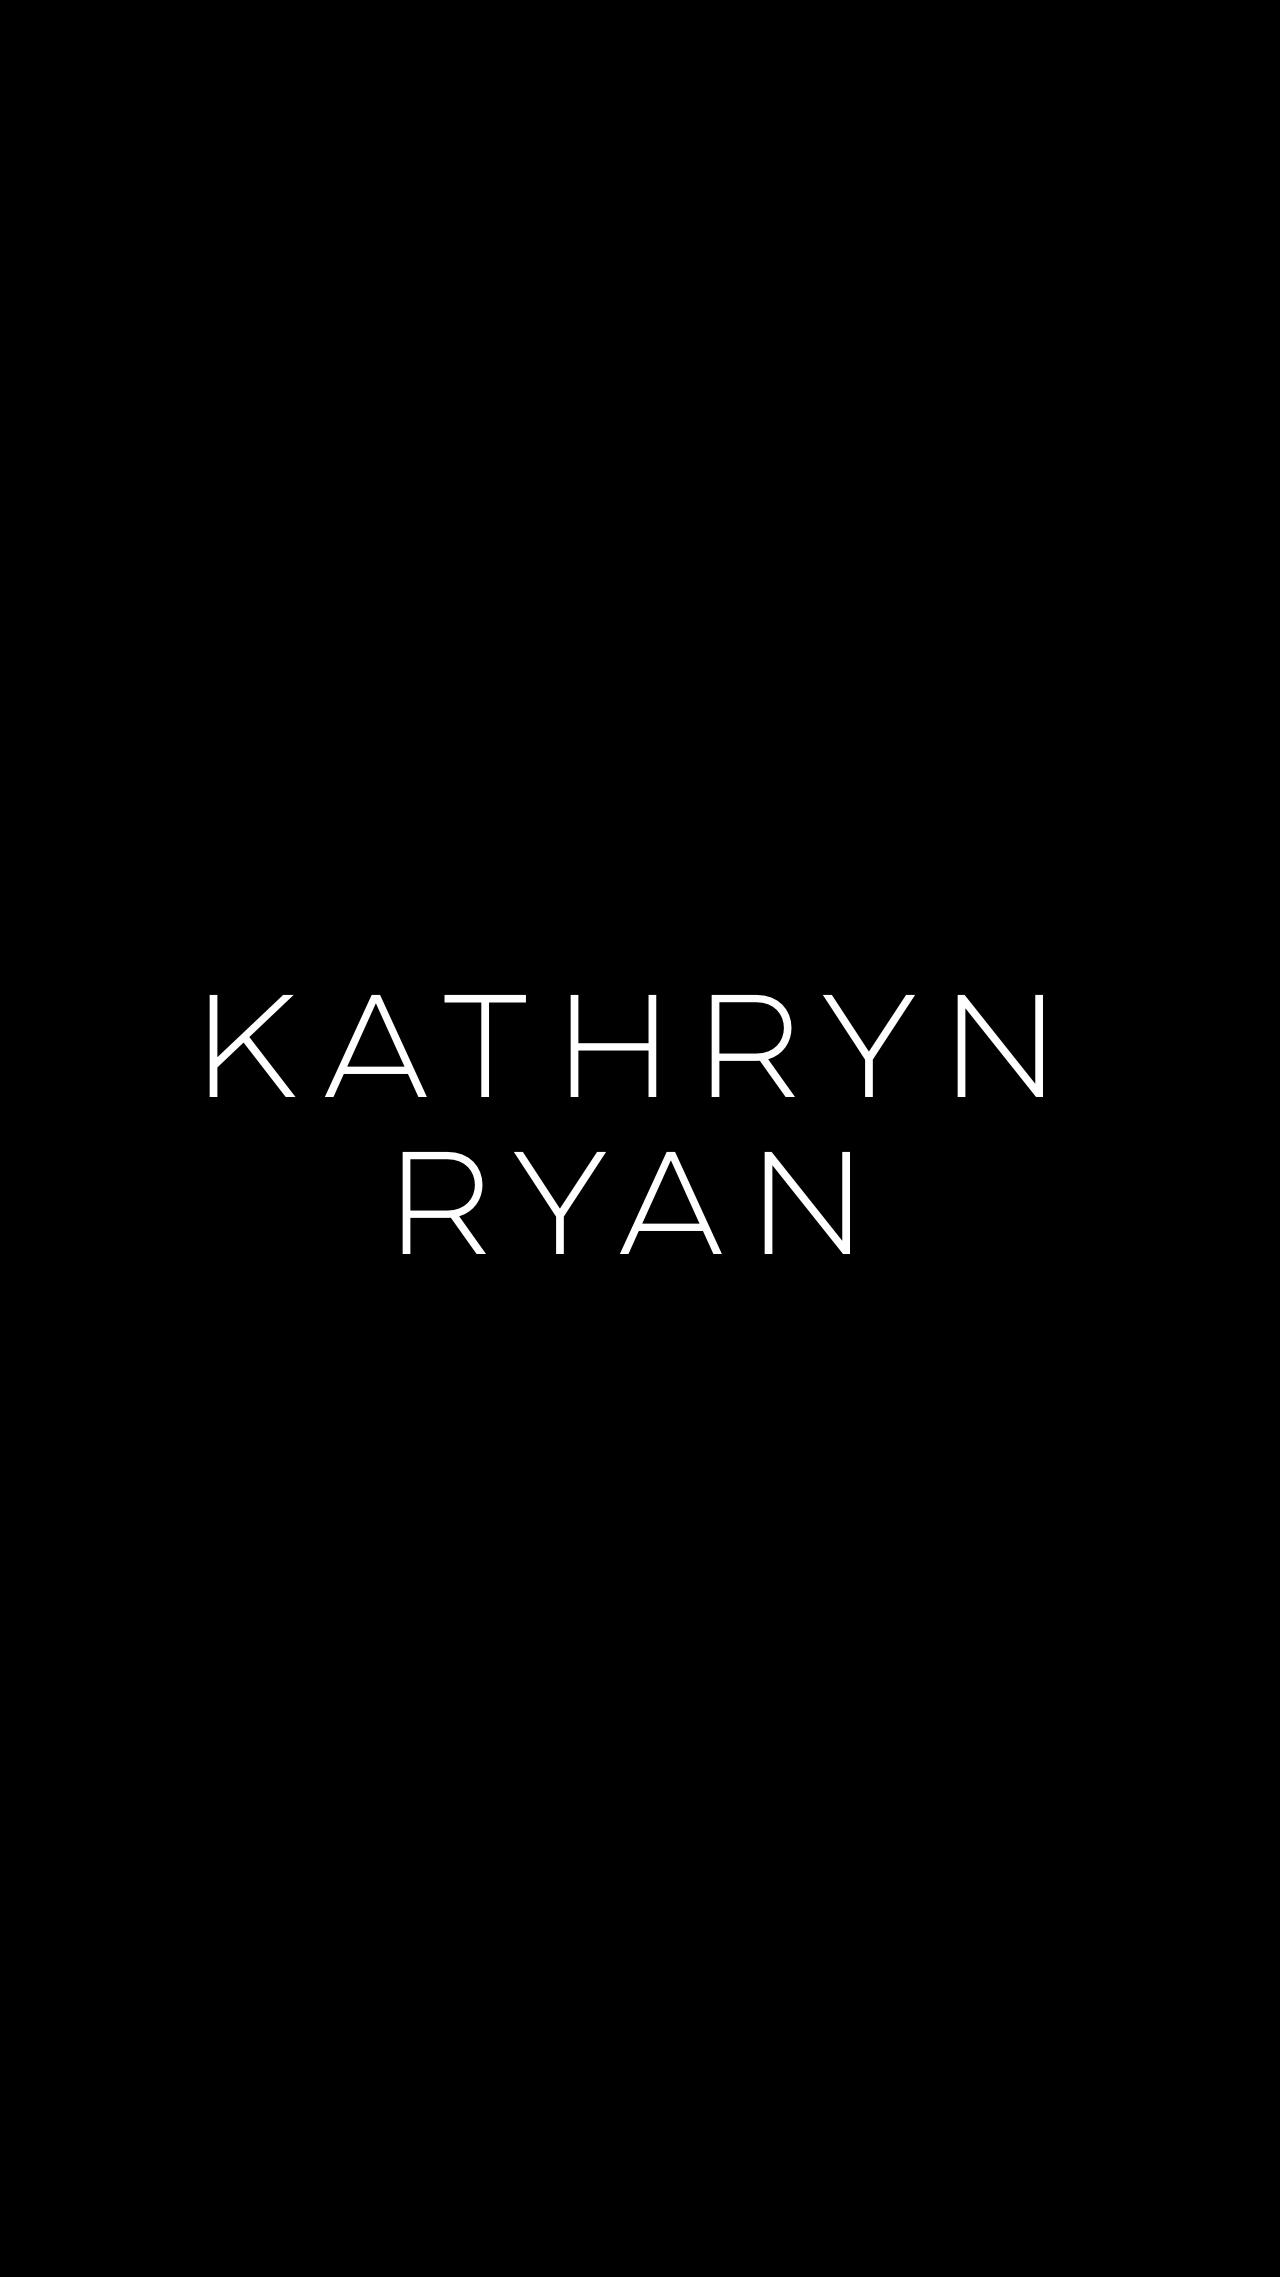 KATHRYN RYAN.jpg